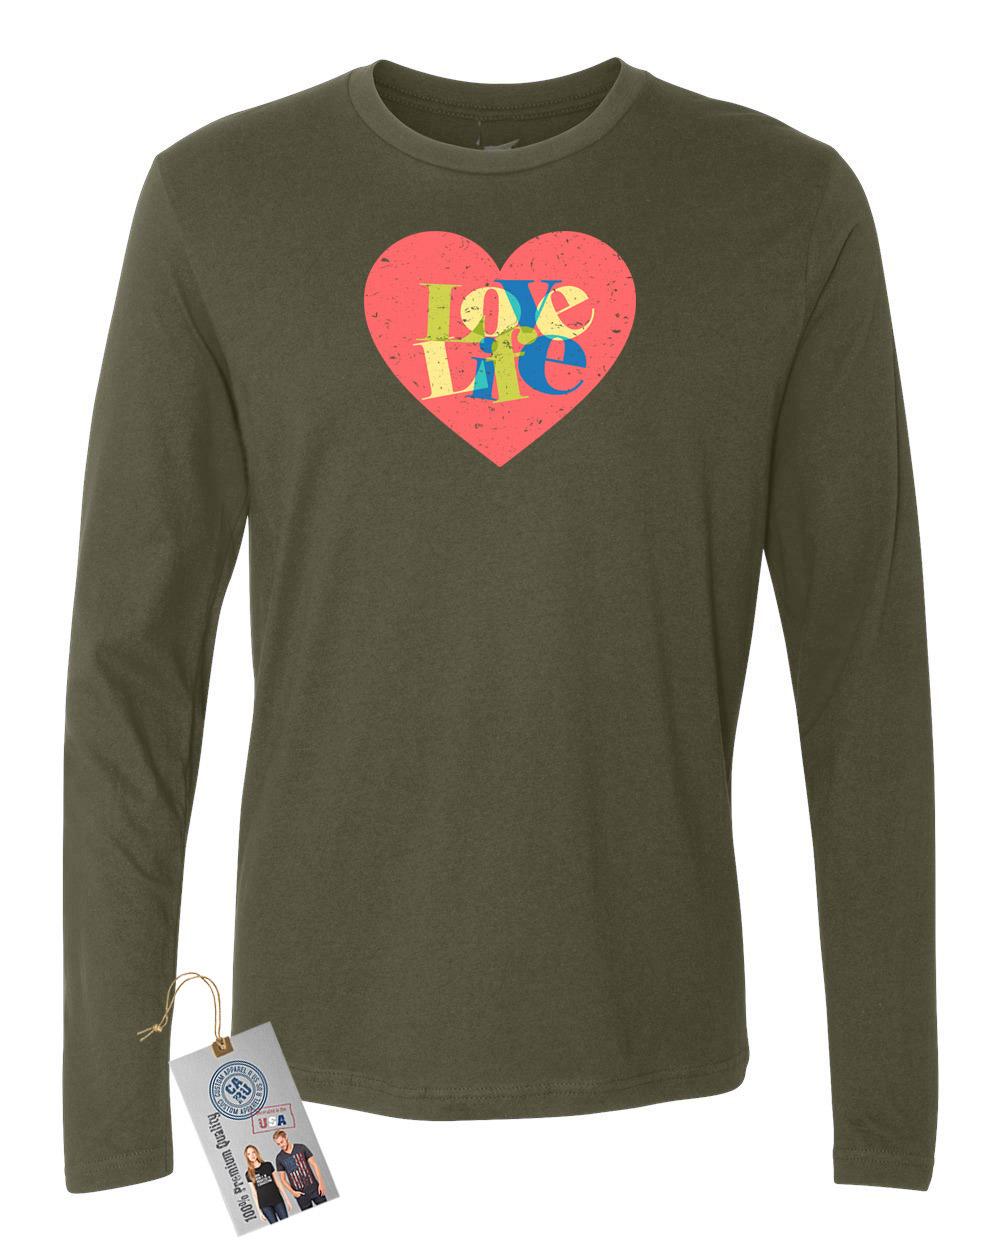 f77cedb983d Love Life Colorful Heart Summer Mens Long Sleeve Shirt   Magnet ...